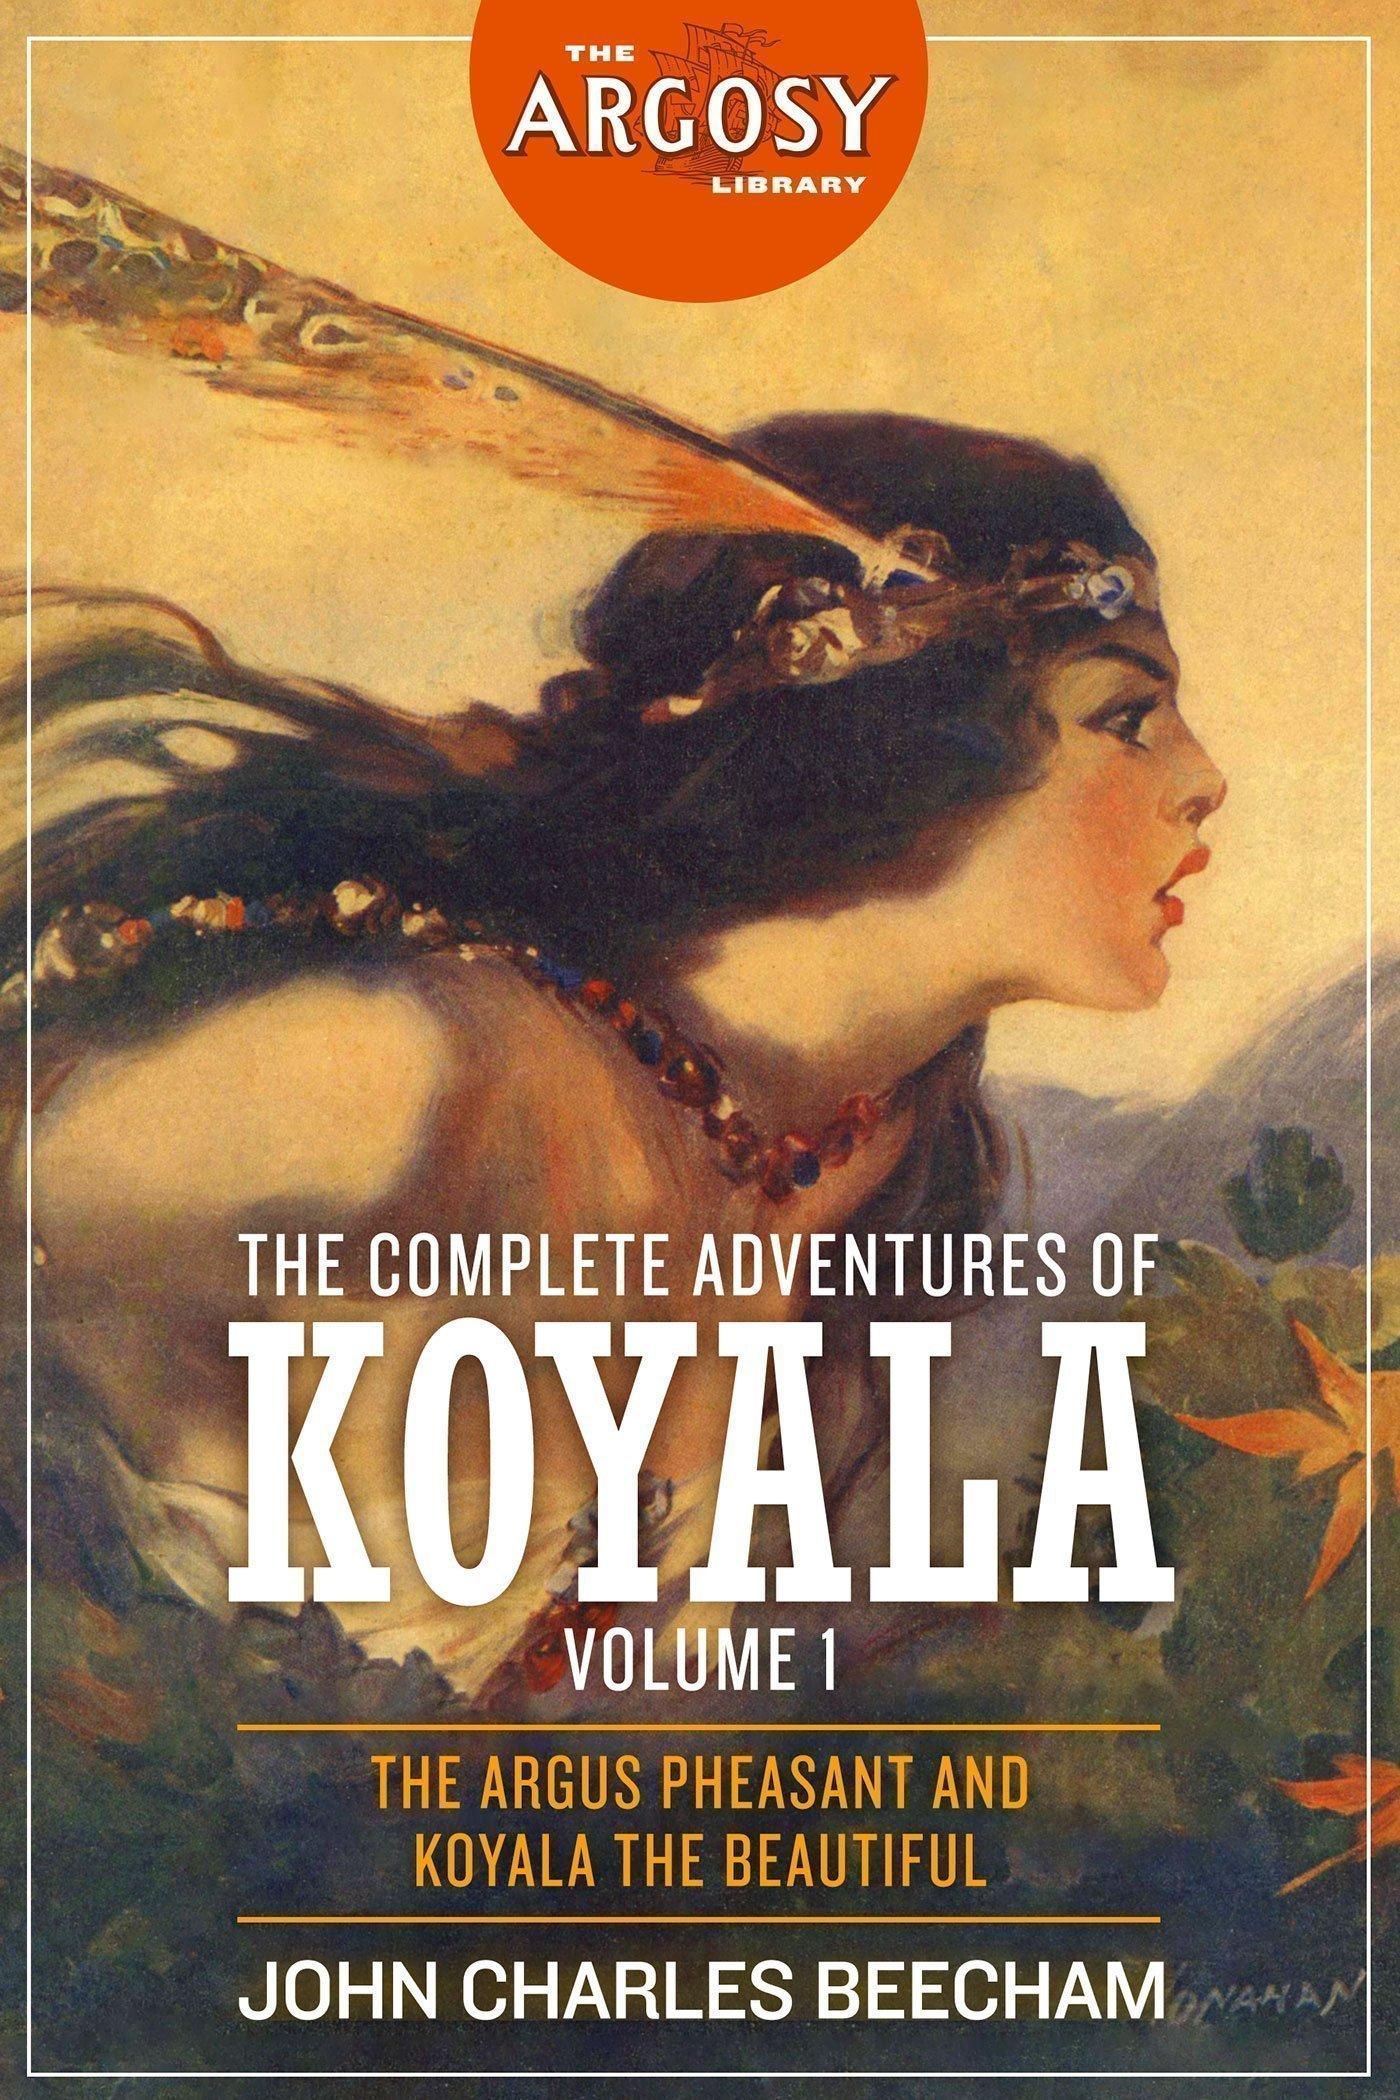 The Complete Adventures of Koyala, Volume 1 (The Argosy Library)